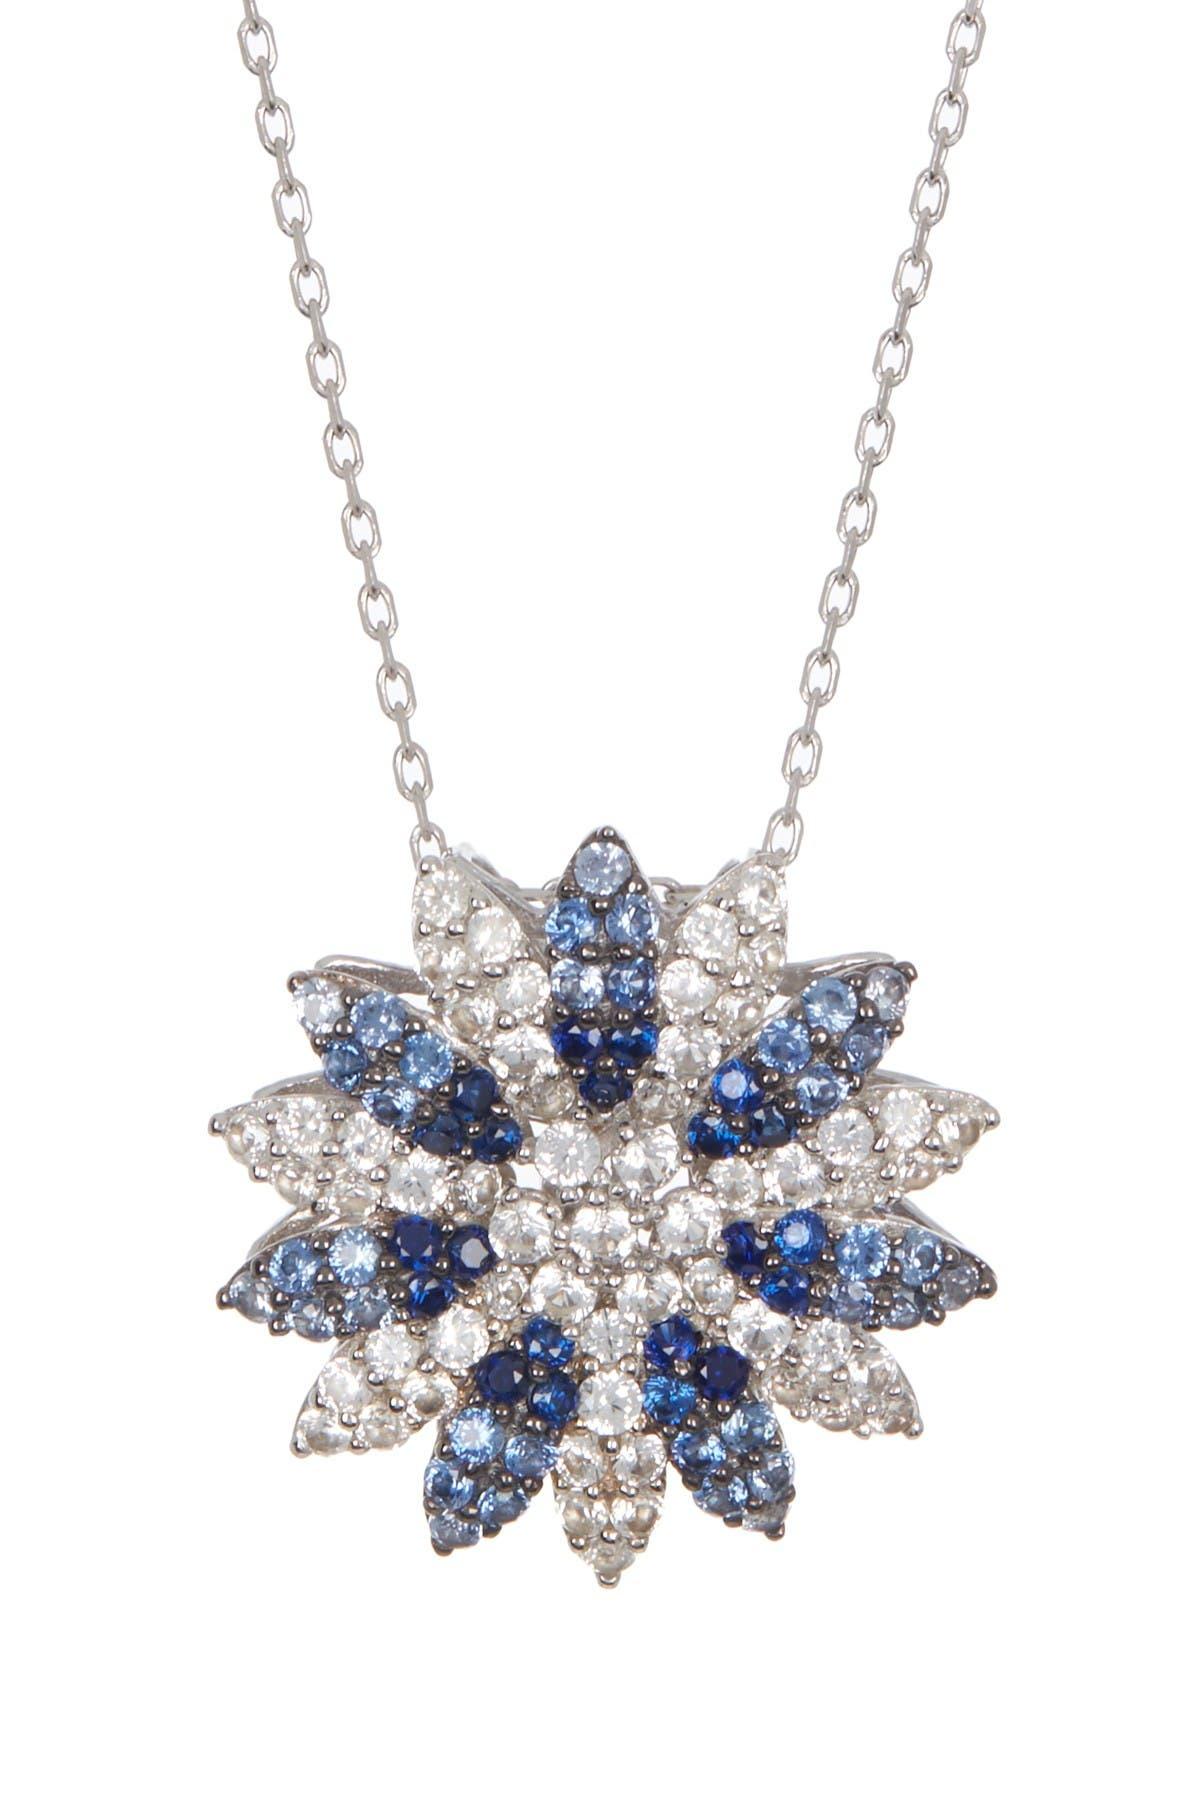 Image of Suzy Levian Sterling Silver Sapphire Burst Pendant Necklace